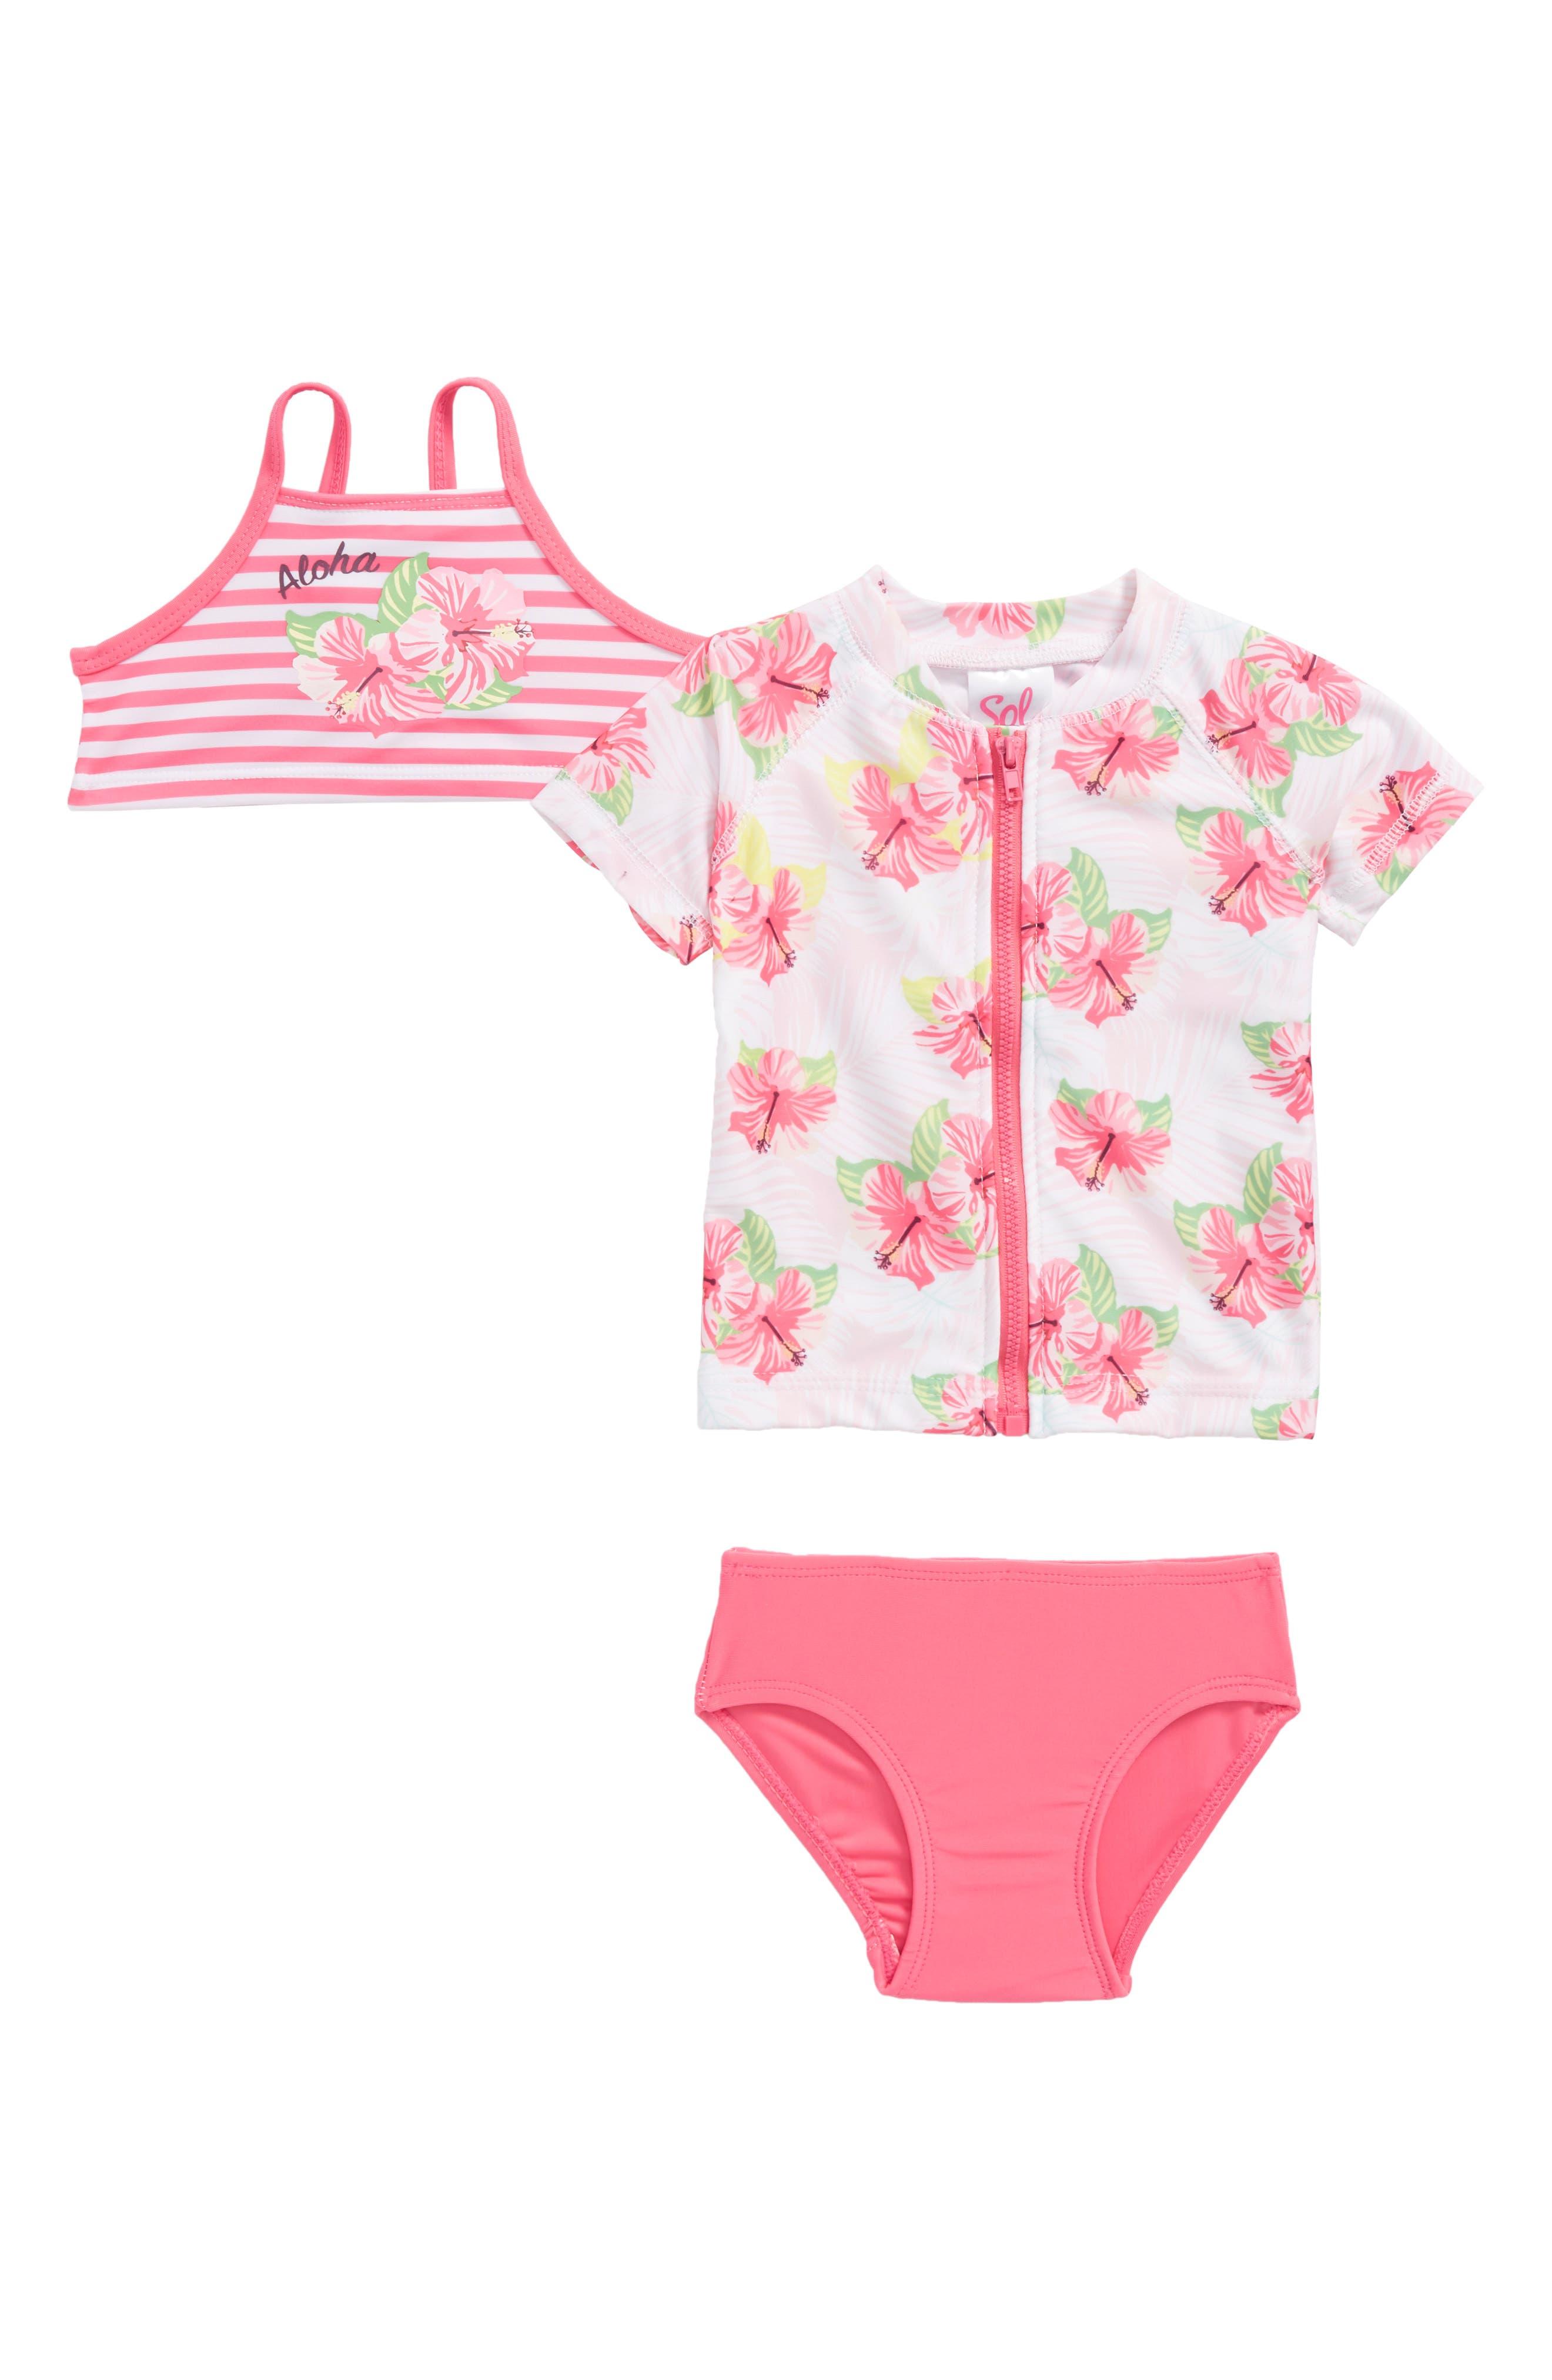 Honolulu Two-Piece Swimsuit with Rashguard,                             Main thumbnail 1, color,                             Pink Multi